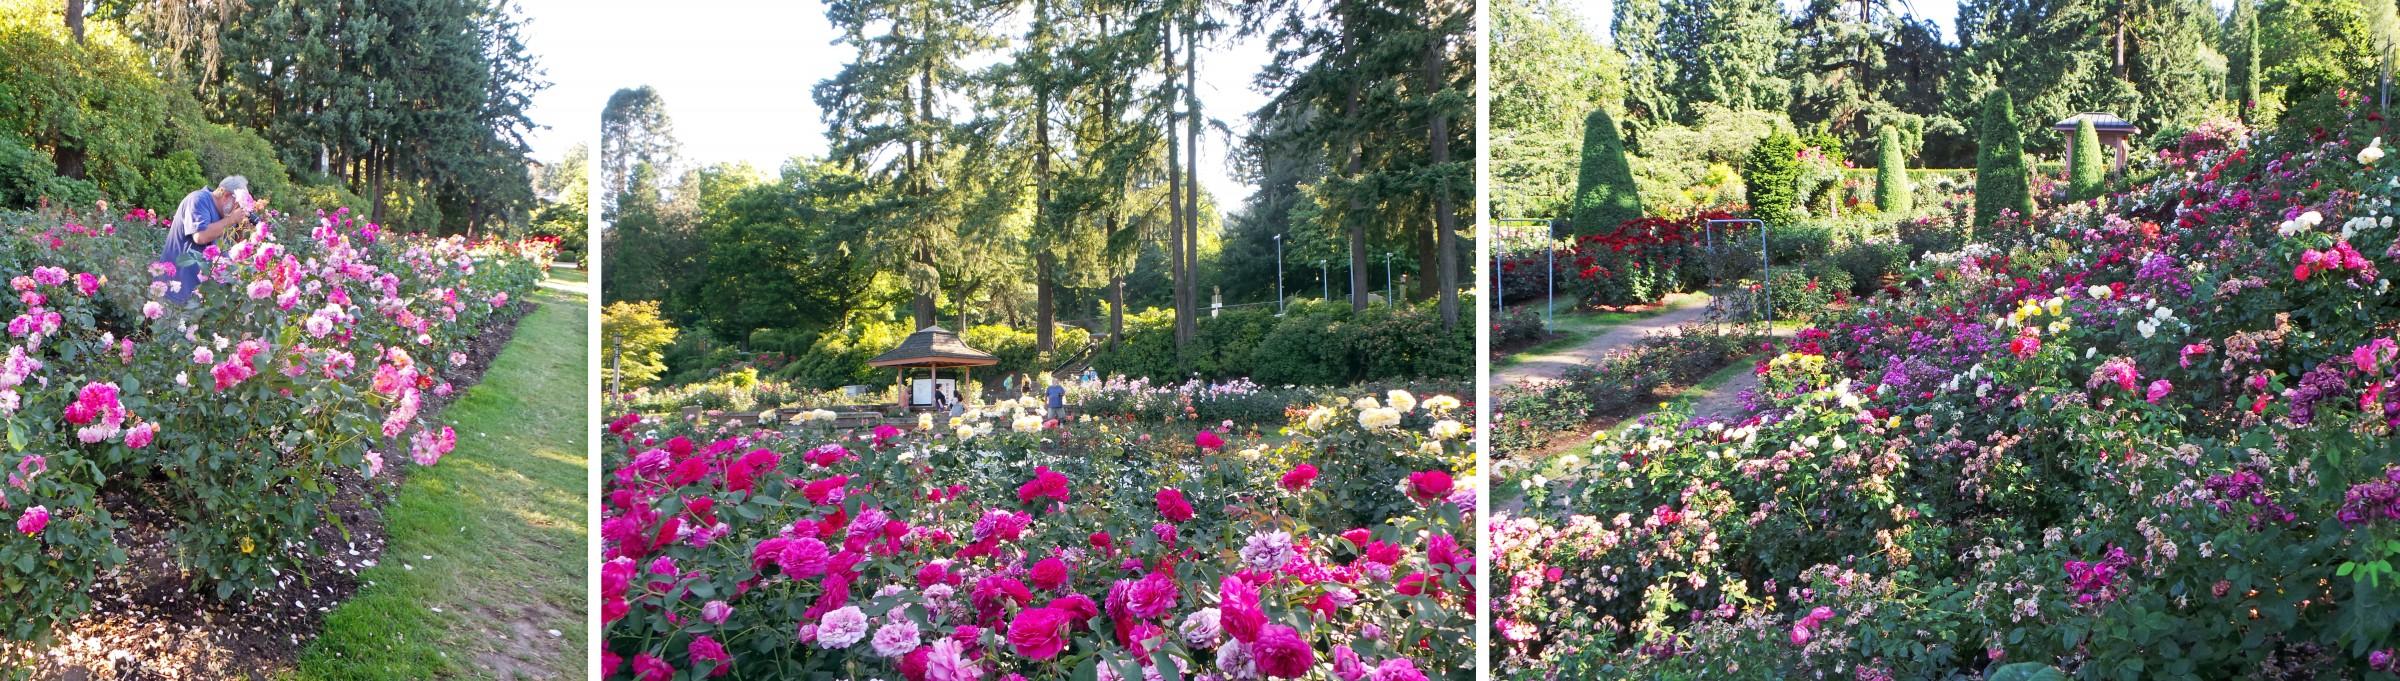 some of the 10000 rose bushes in the international rose test garden portland japanese garden - Portland Rose Garden